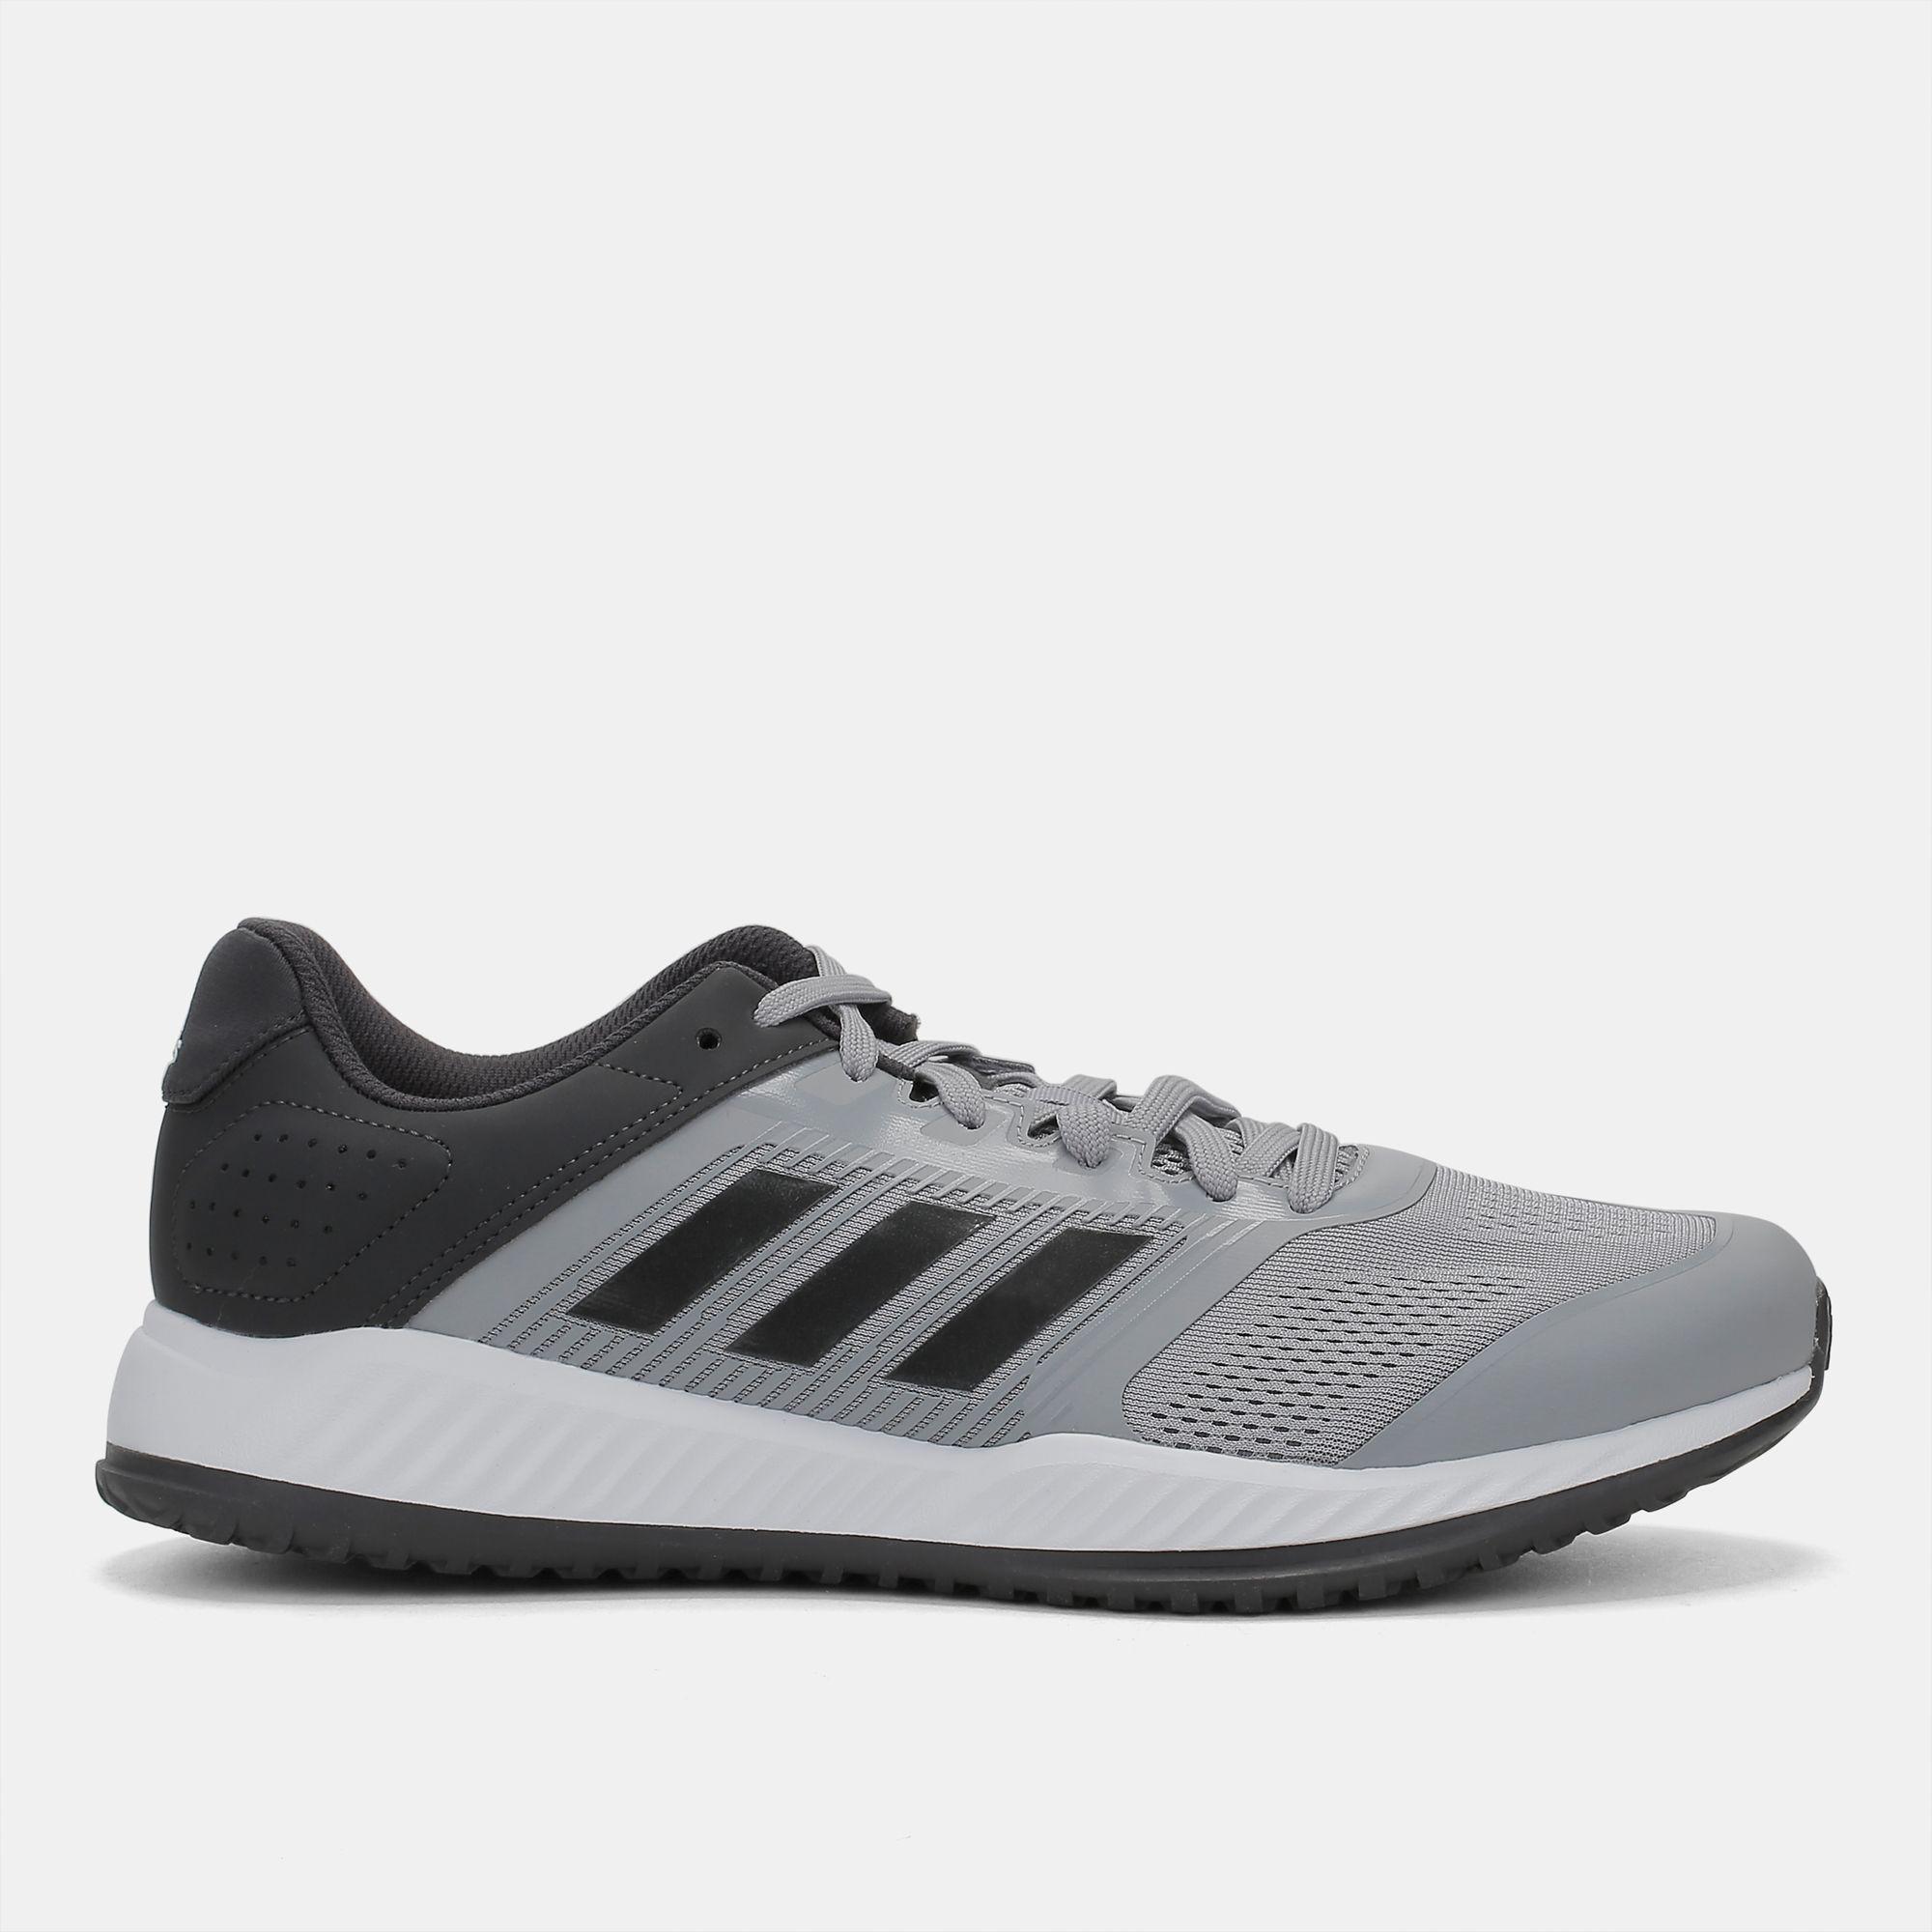 Zapatos deportivos zapatos zapatos adidas ZG formación hombres venta venta SSS